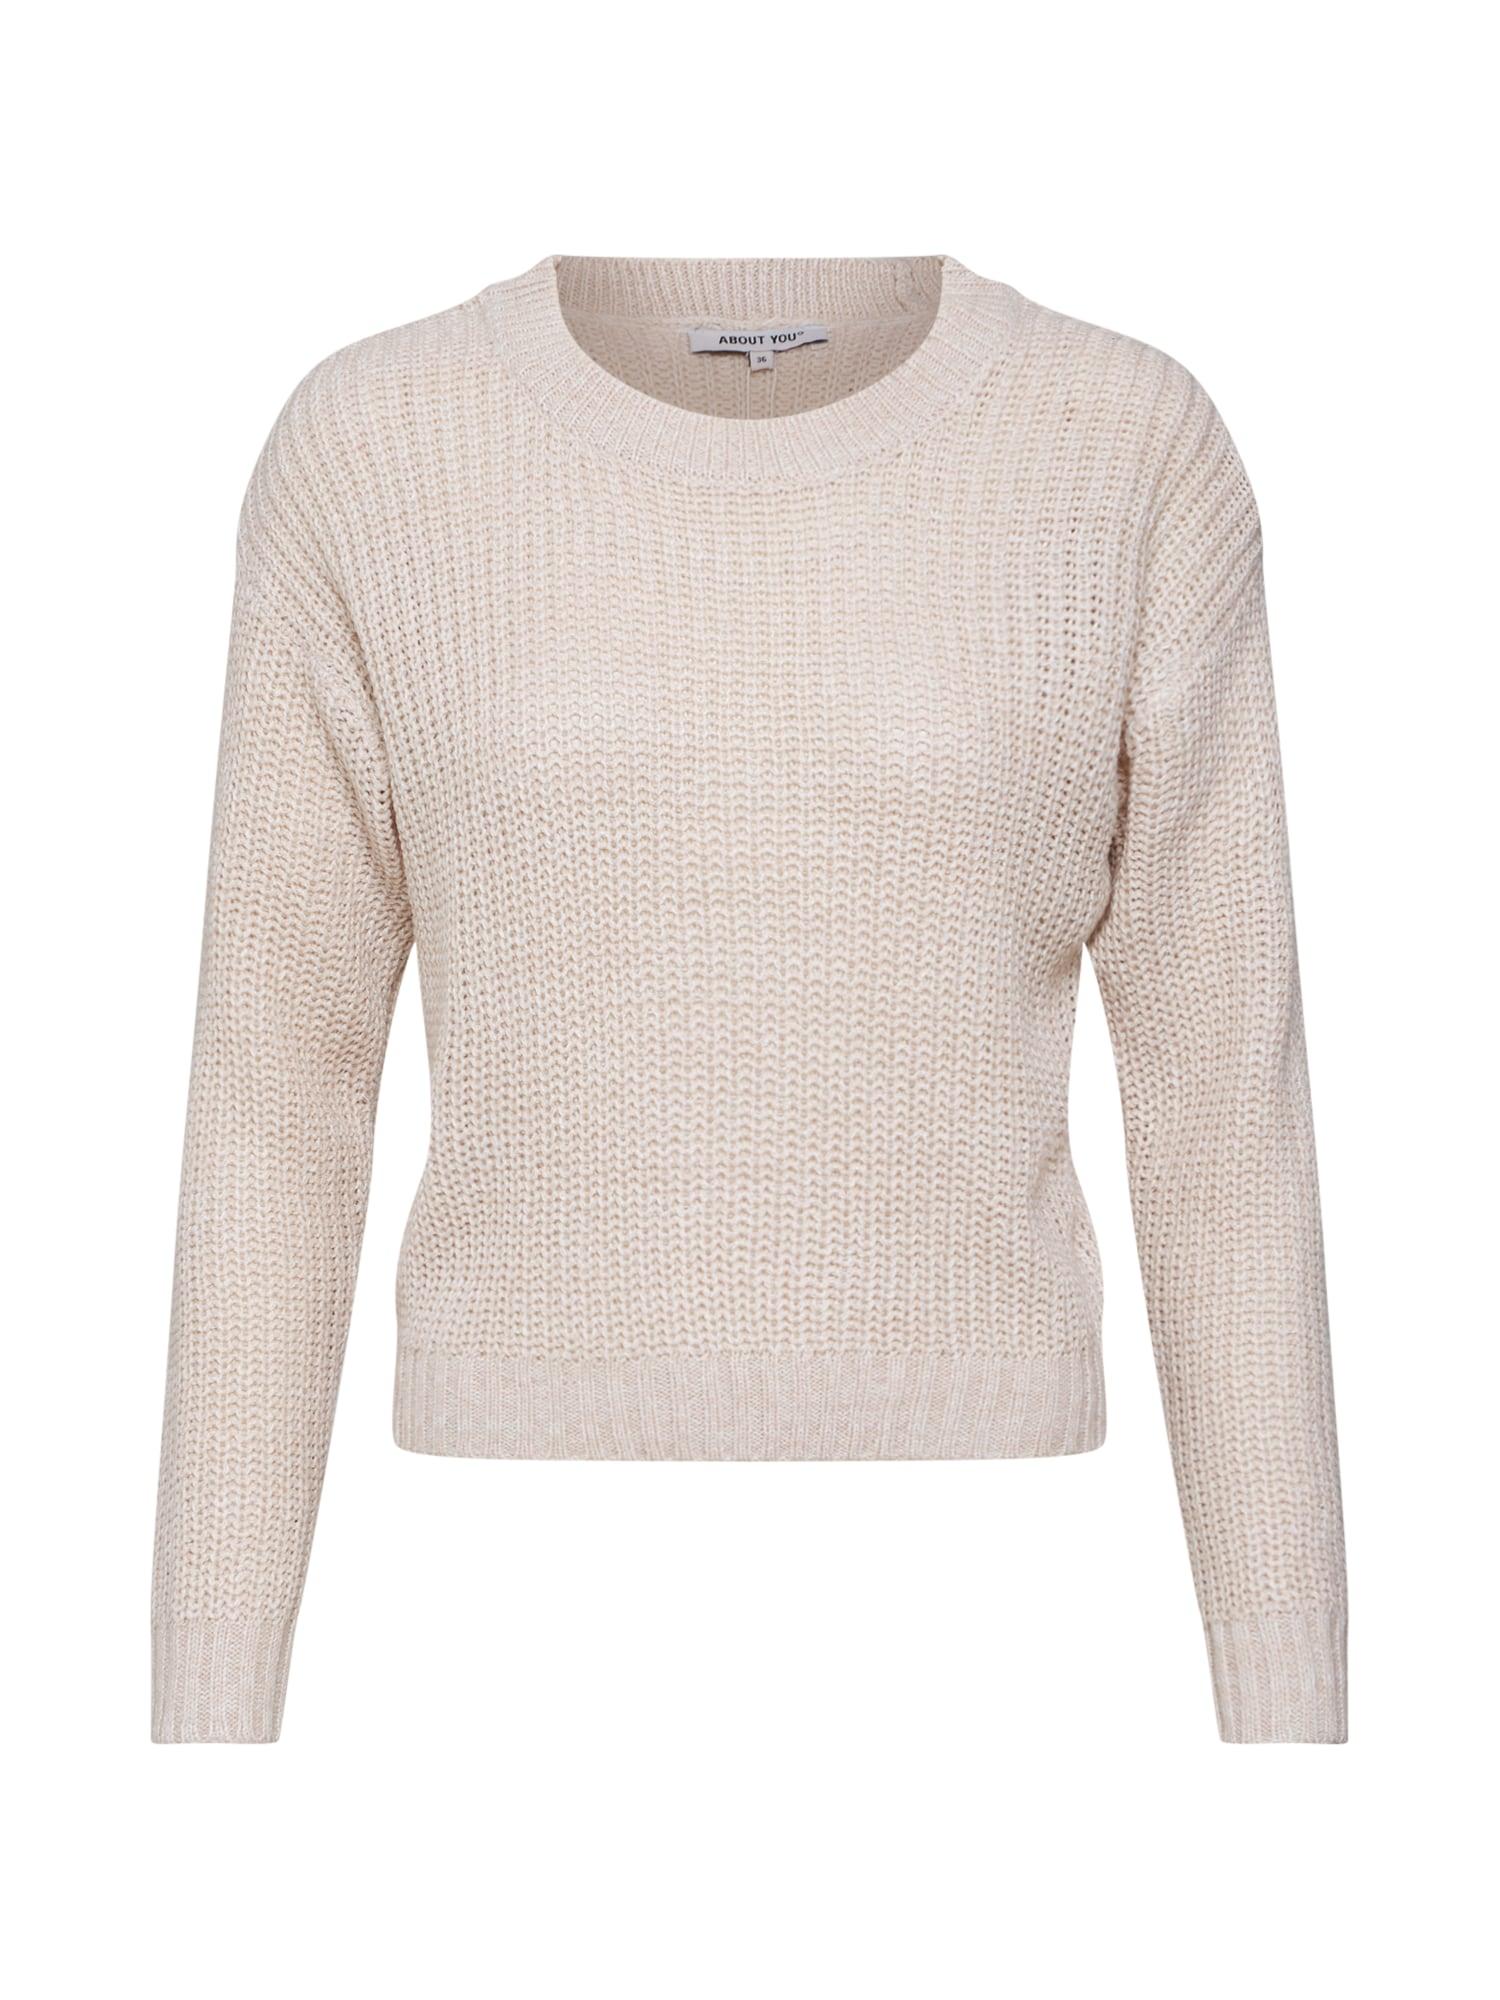 ABOUT YOU Megztinis 'Malina' pudros spalva